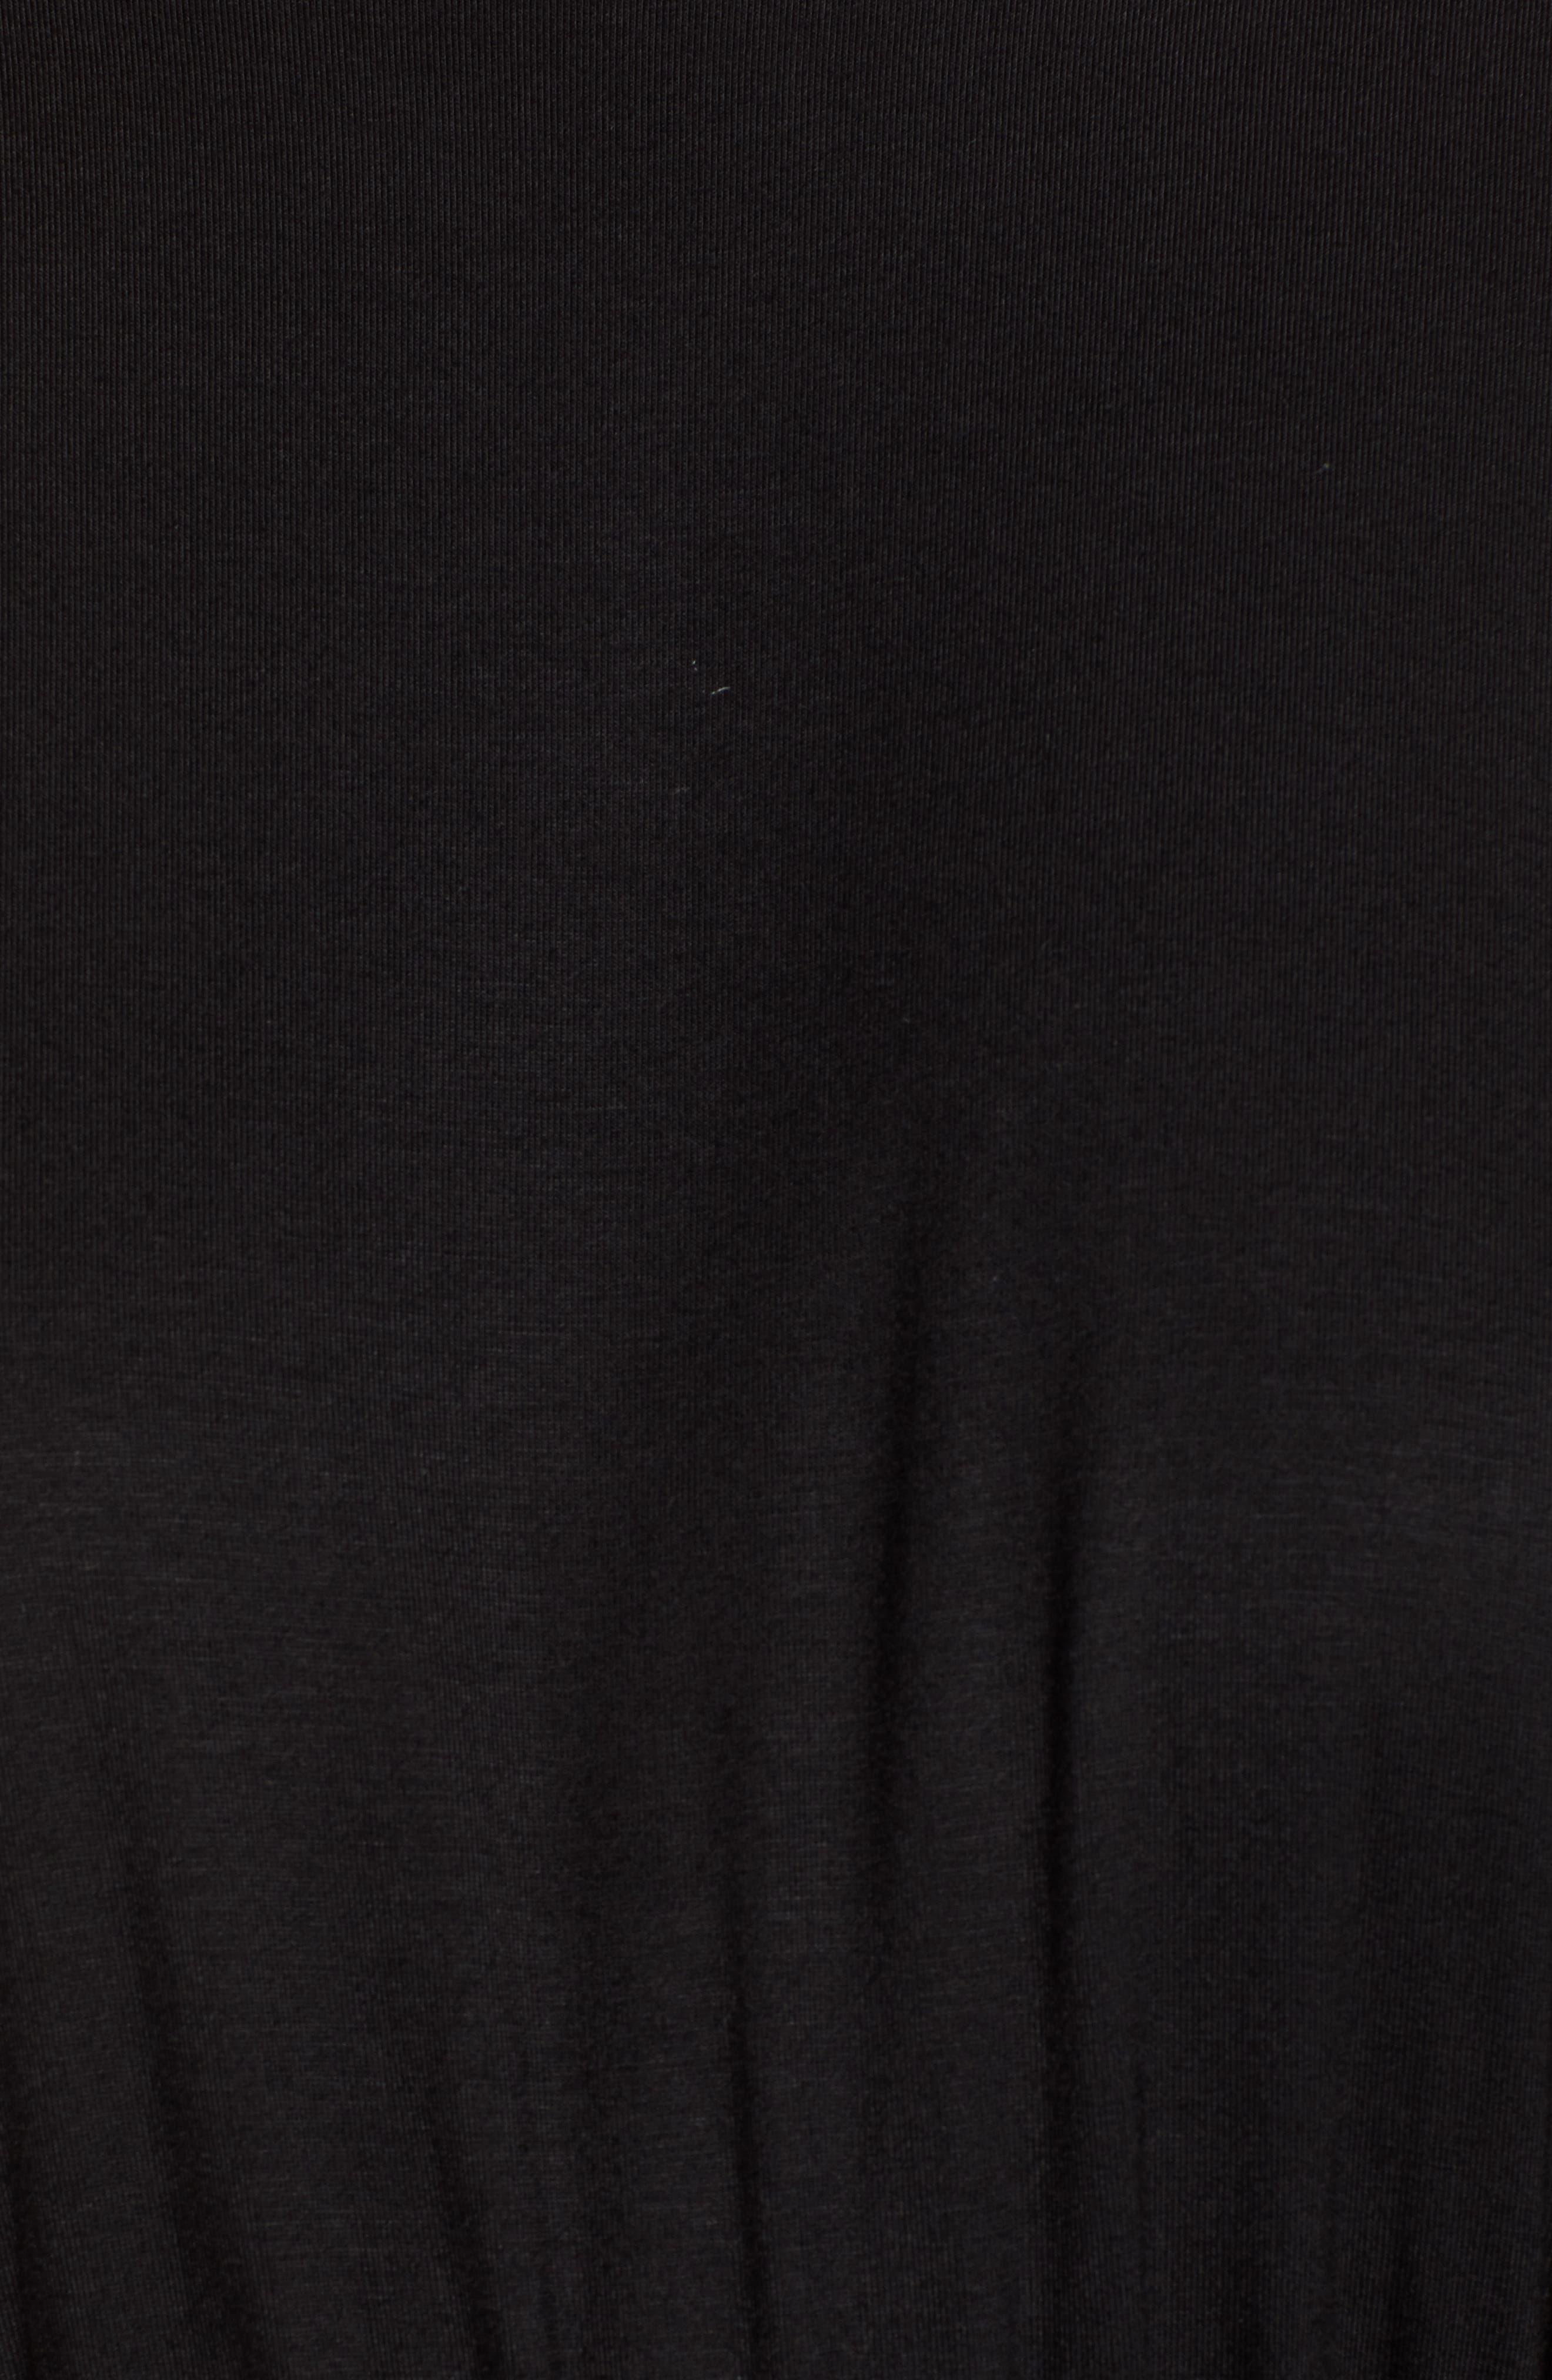 Bishop + Young Slit Sleeve Wrap Style Dress,                             Alternate thumbnail 3, color,                             Black